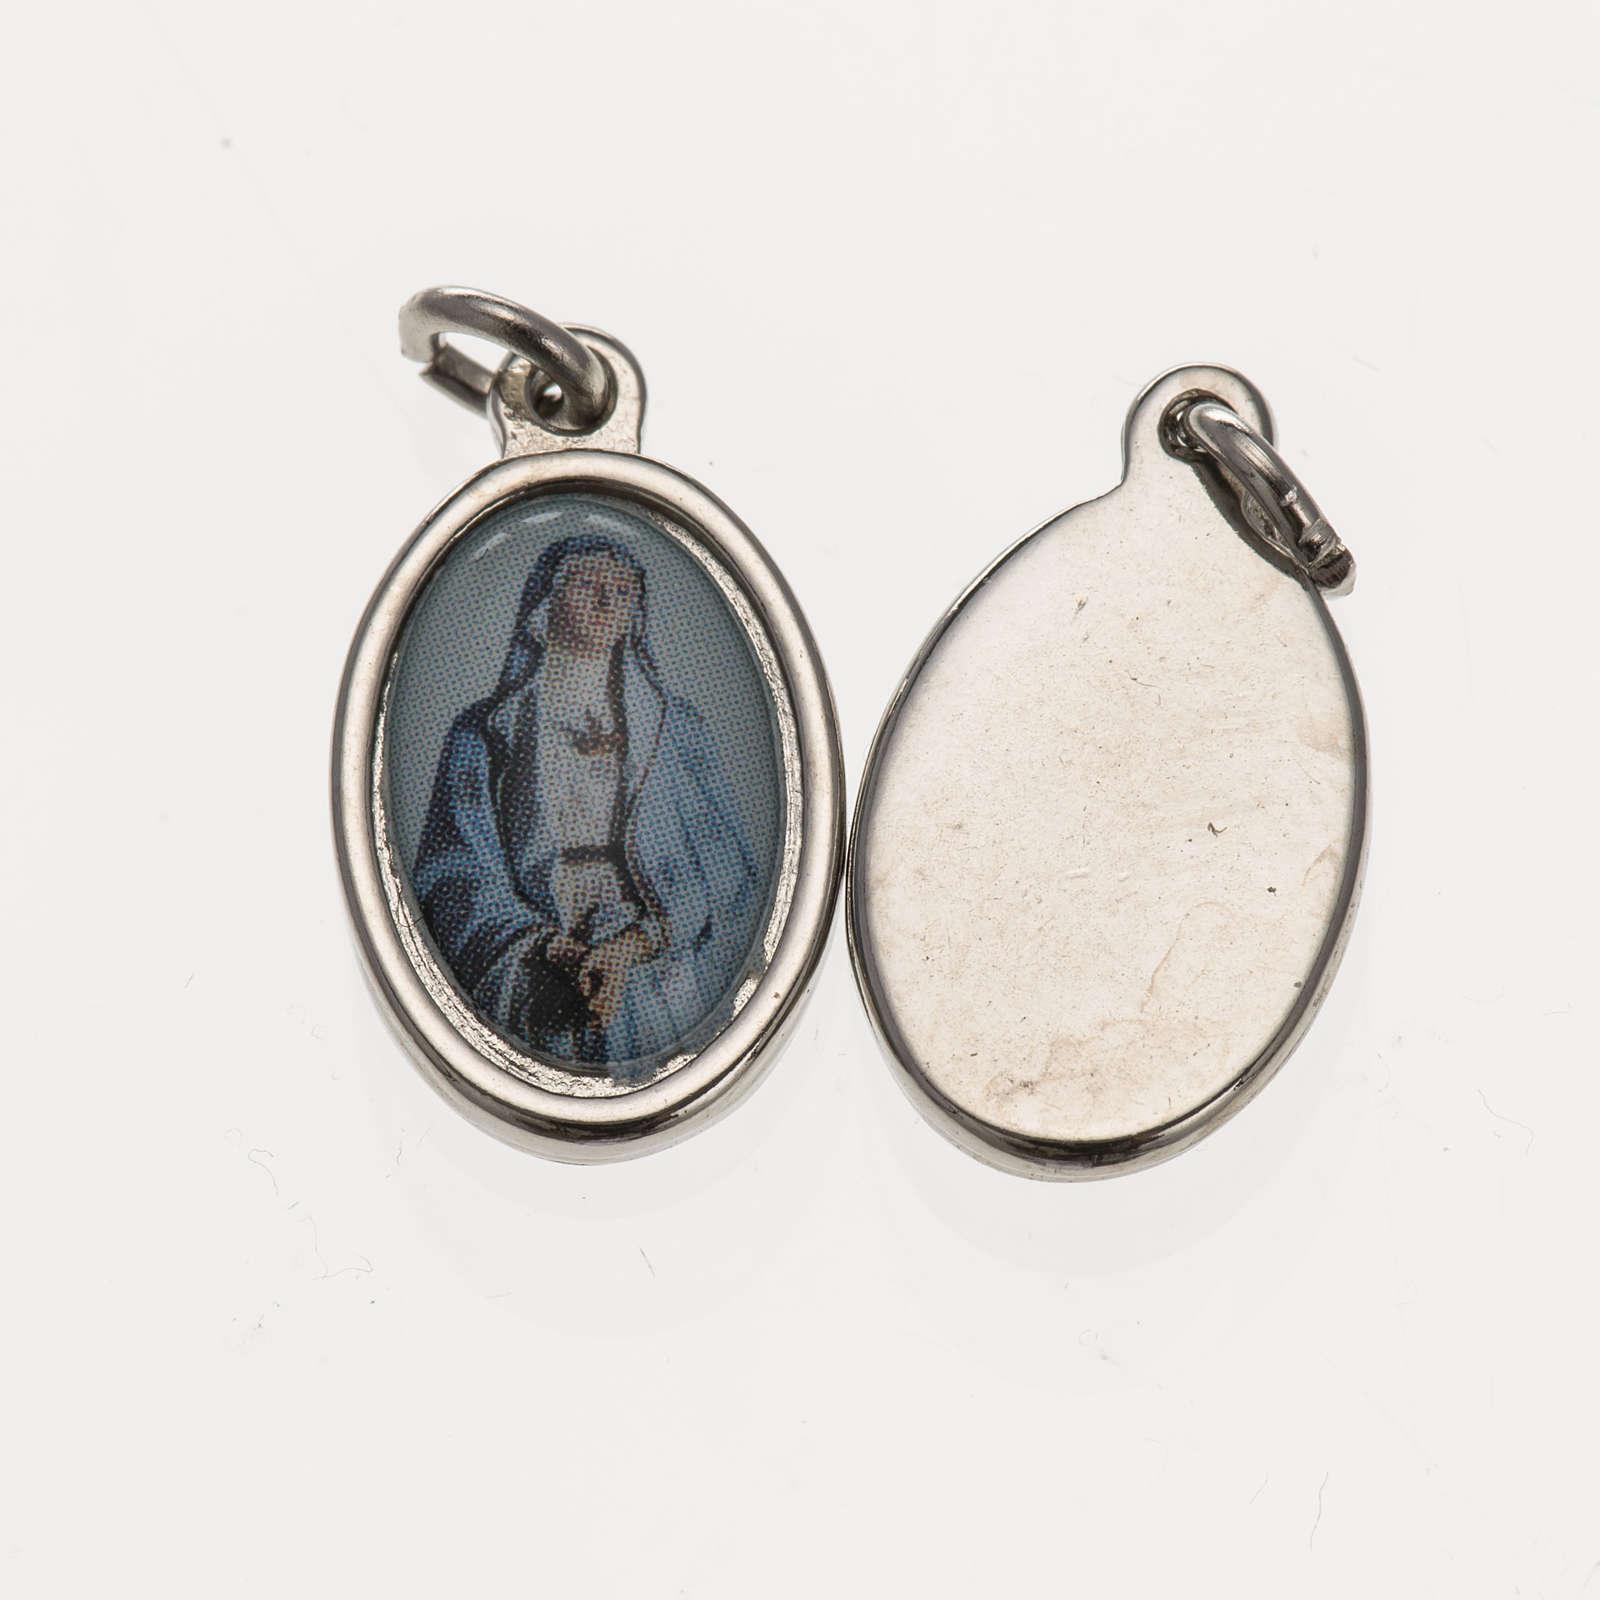 Medalla Vigen Dolores metal plateado resina 1,5x 1 cm 4